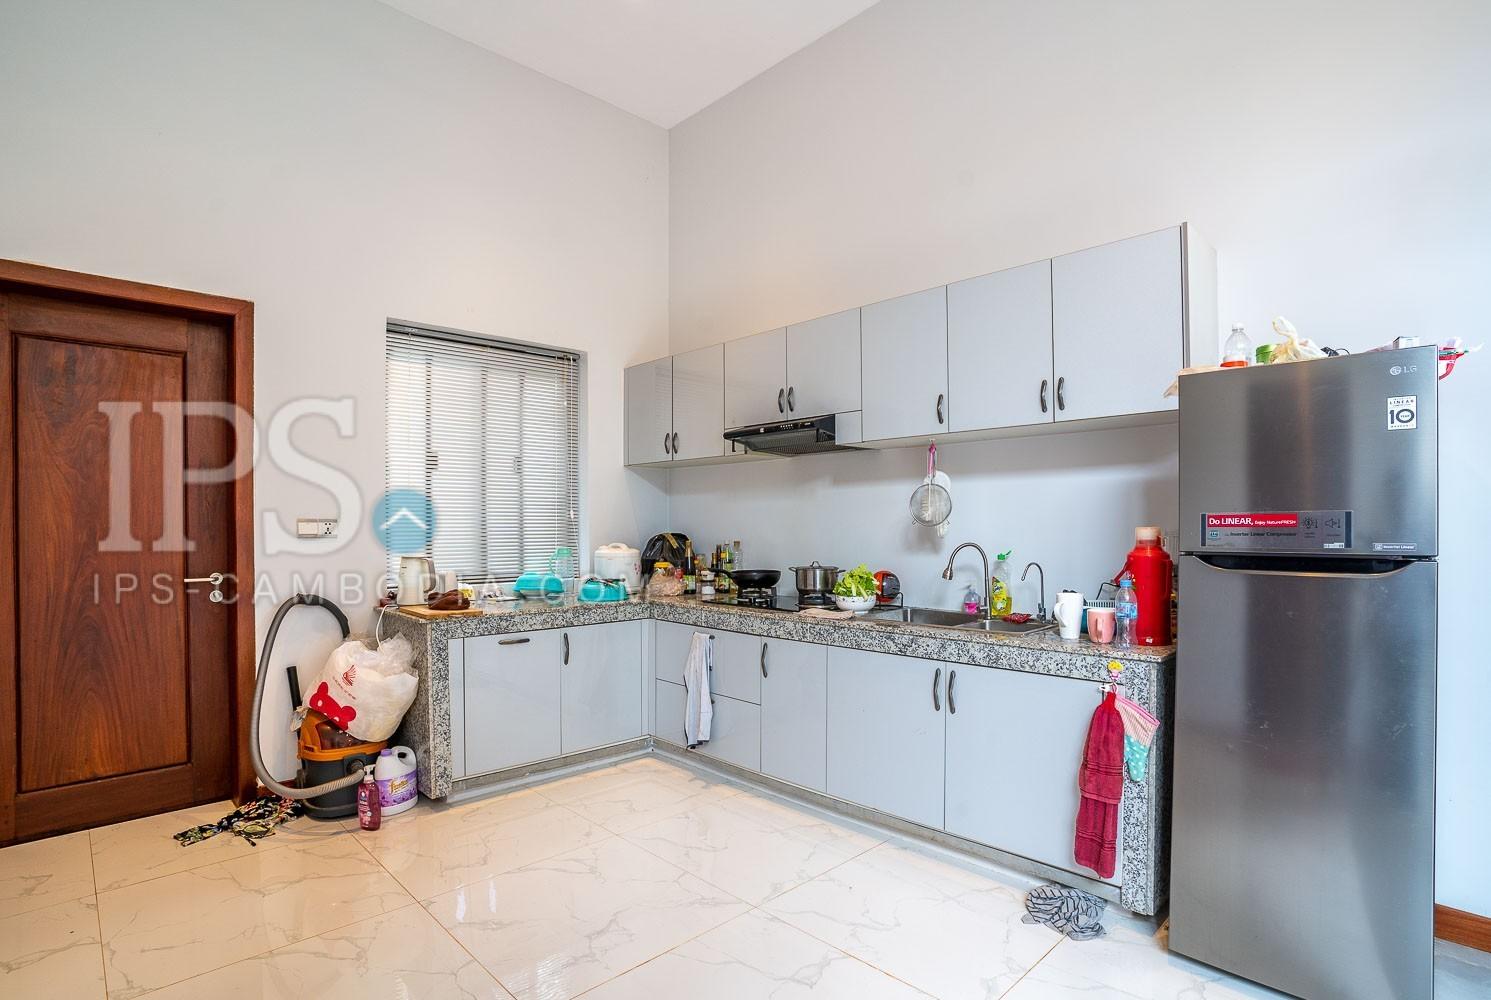 7 Bedroom Villa  4 Bedroom Apartment For Sale - Sala Kamreuk, Siem Reap